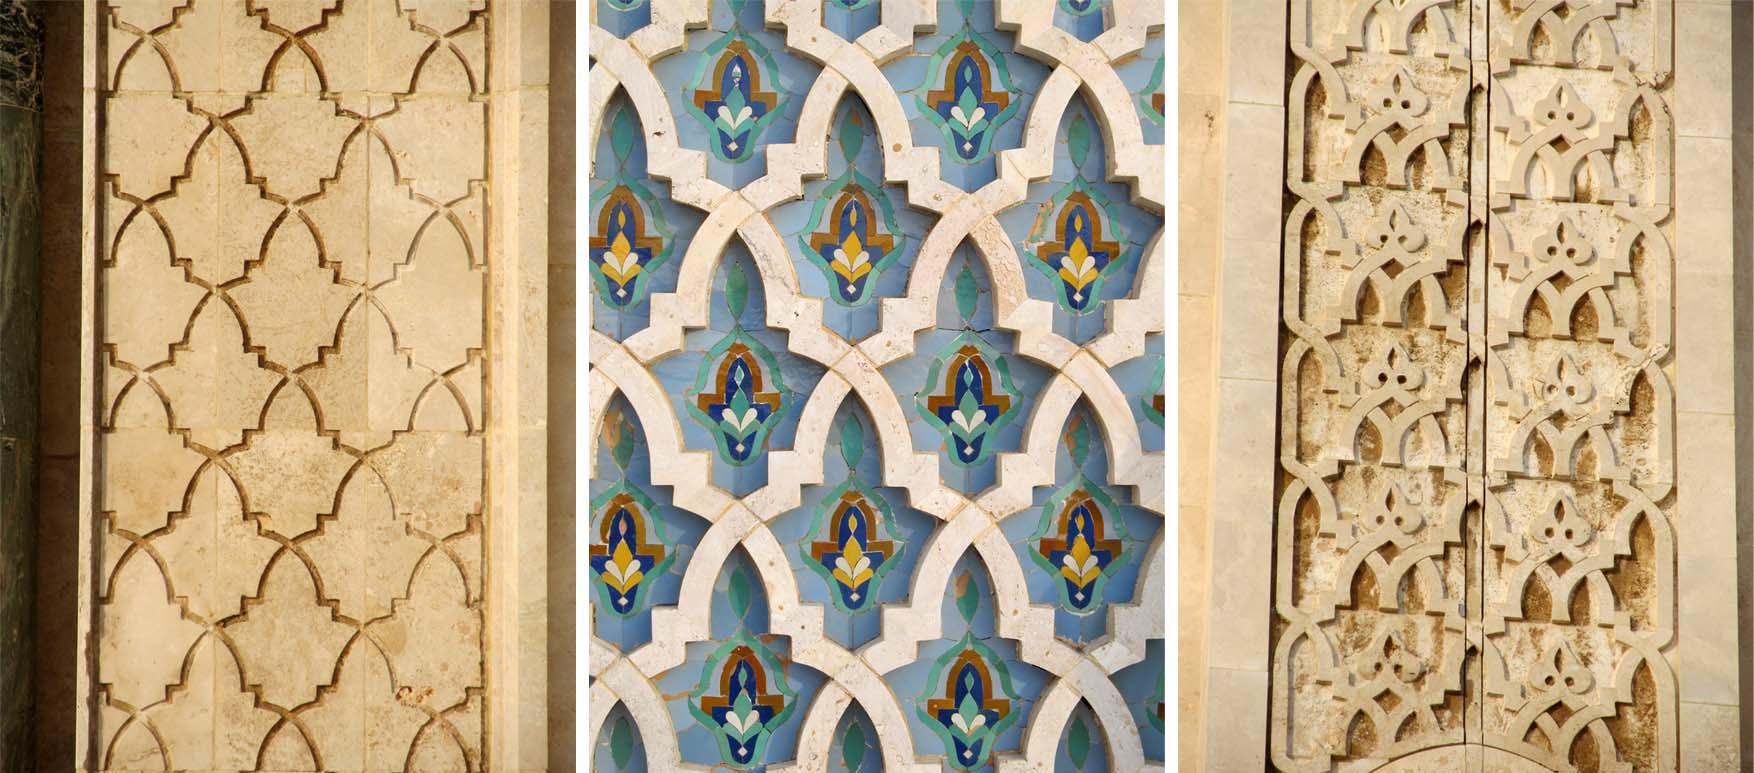 86 maroko kazablanka velika dzamija